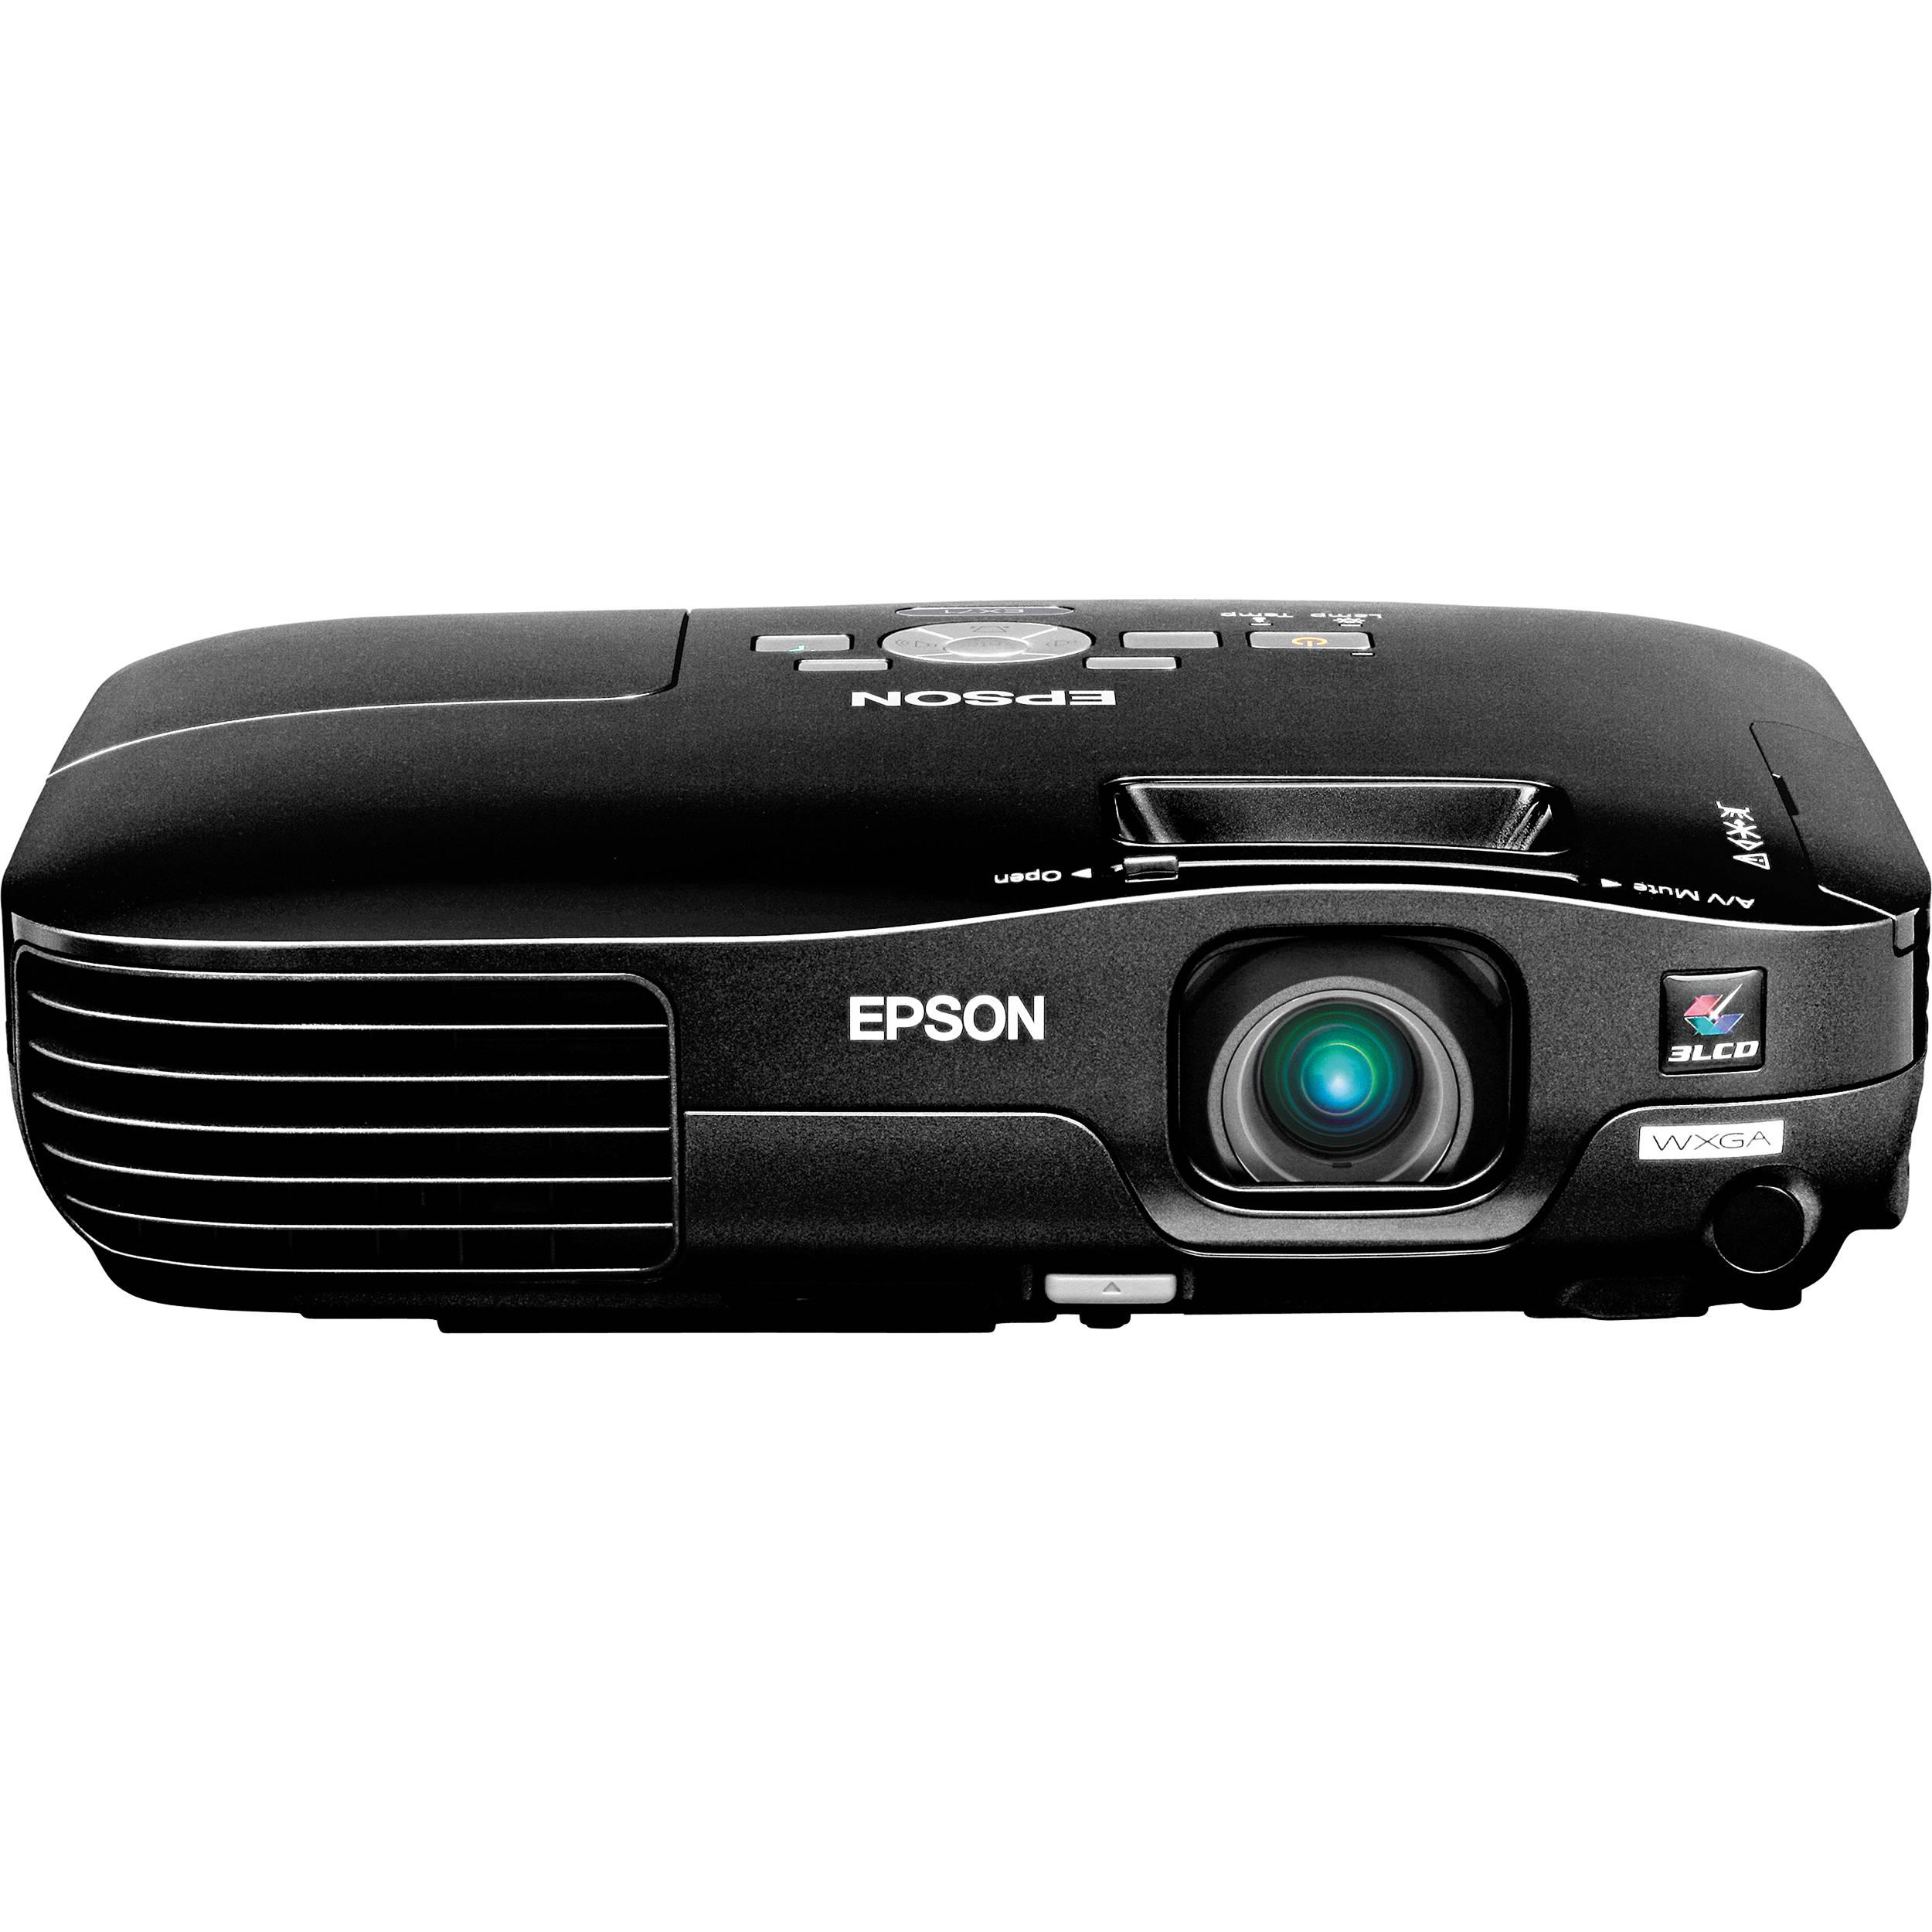 epson ex71 multimedia projector black v11h310120 b b h photo rh bhphotovideo com Epson EX51 Projector Bulb Epson EX71 Projector Lamp